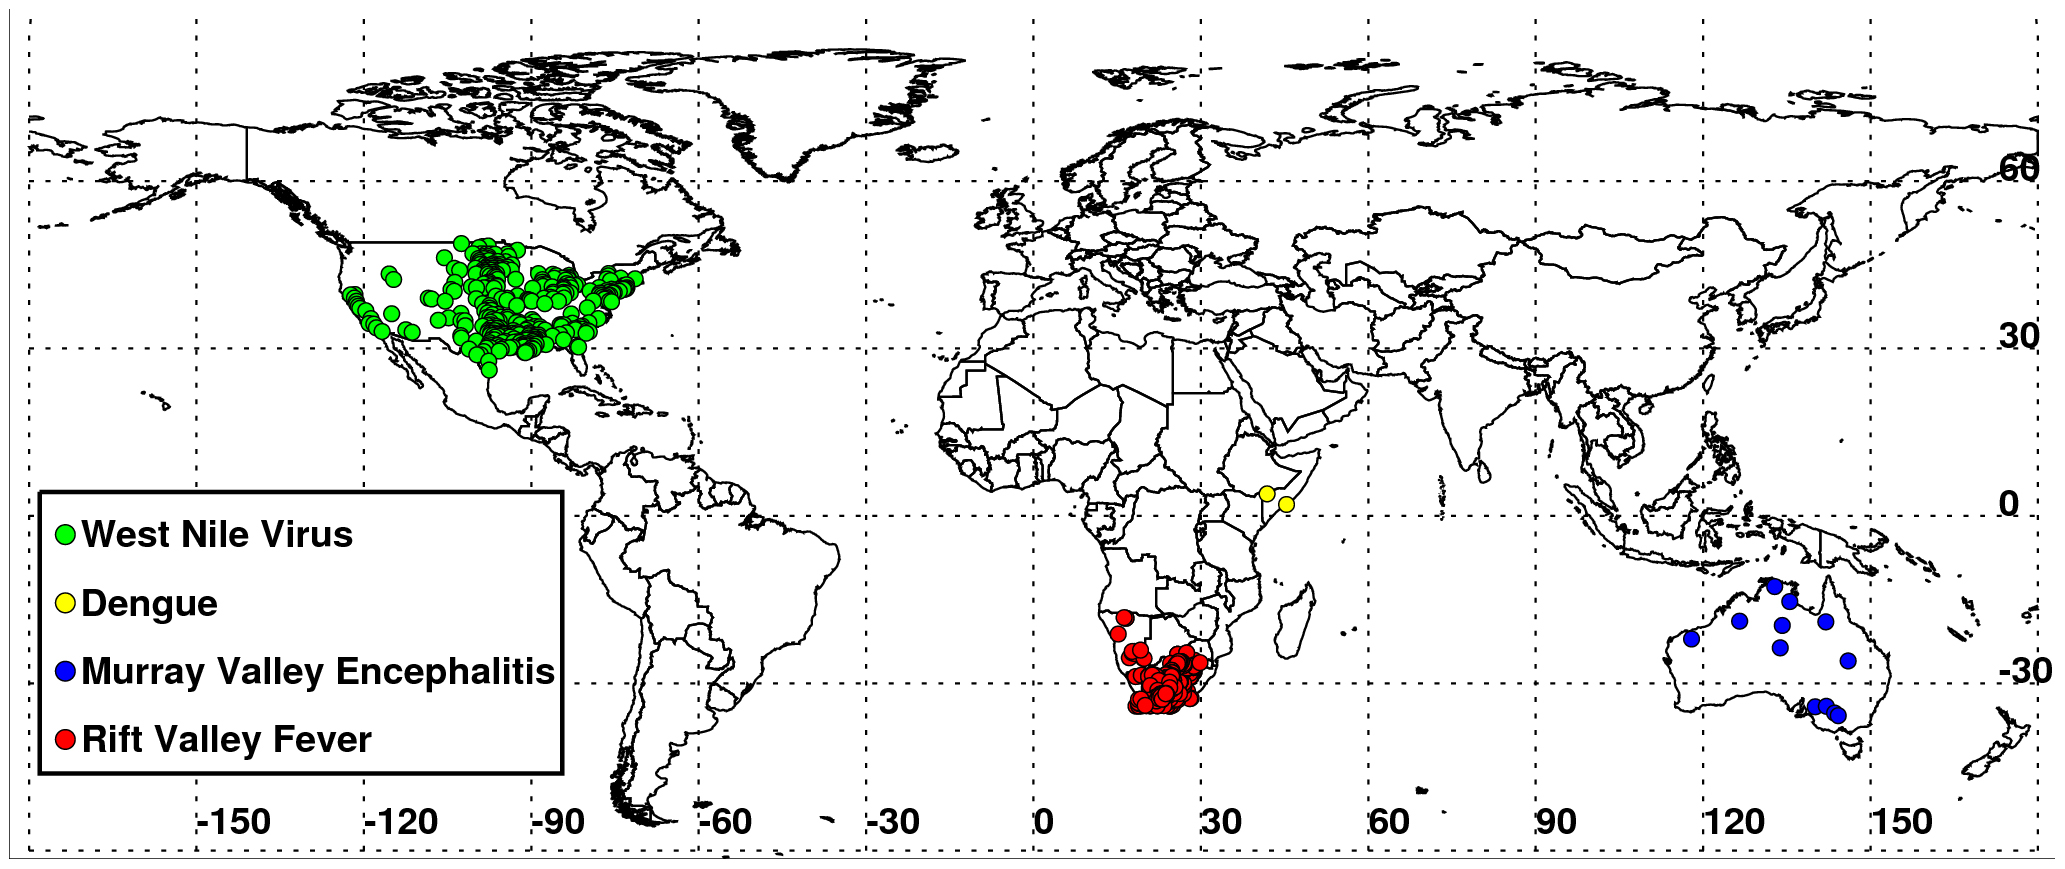 Global Outbreaks Map